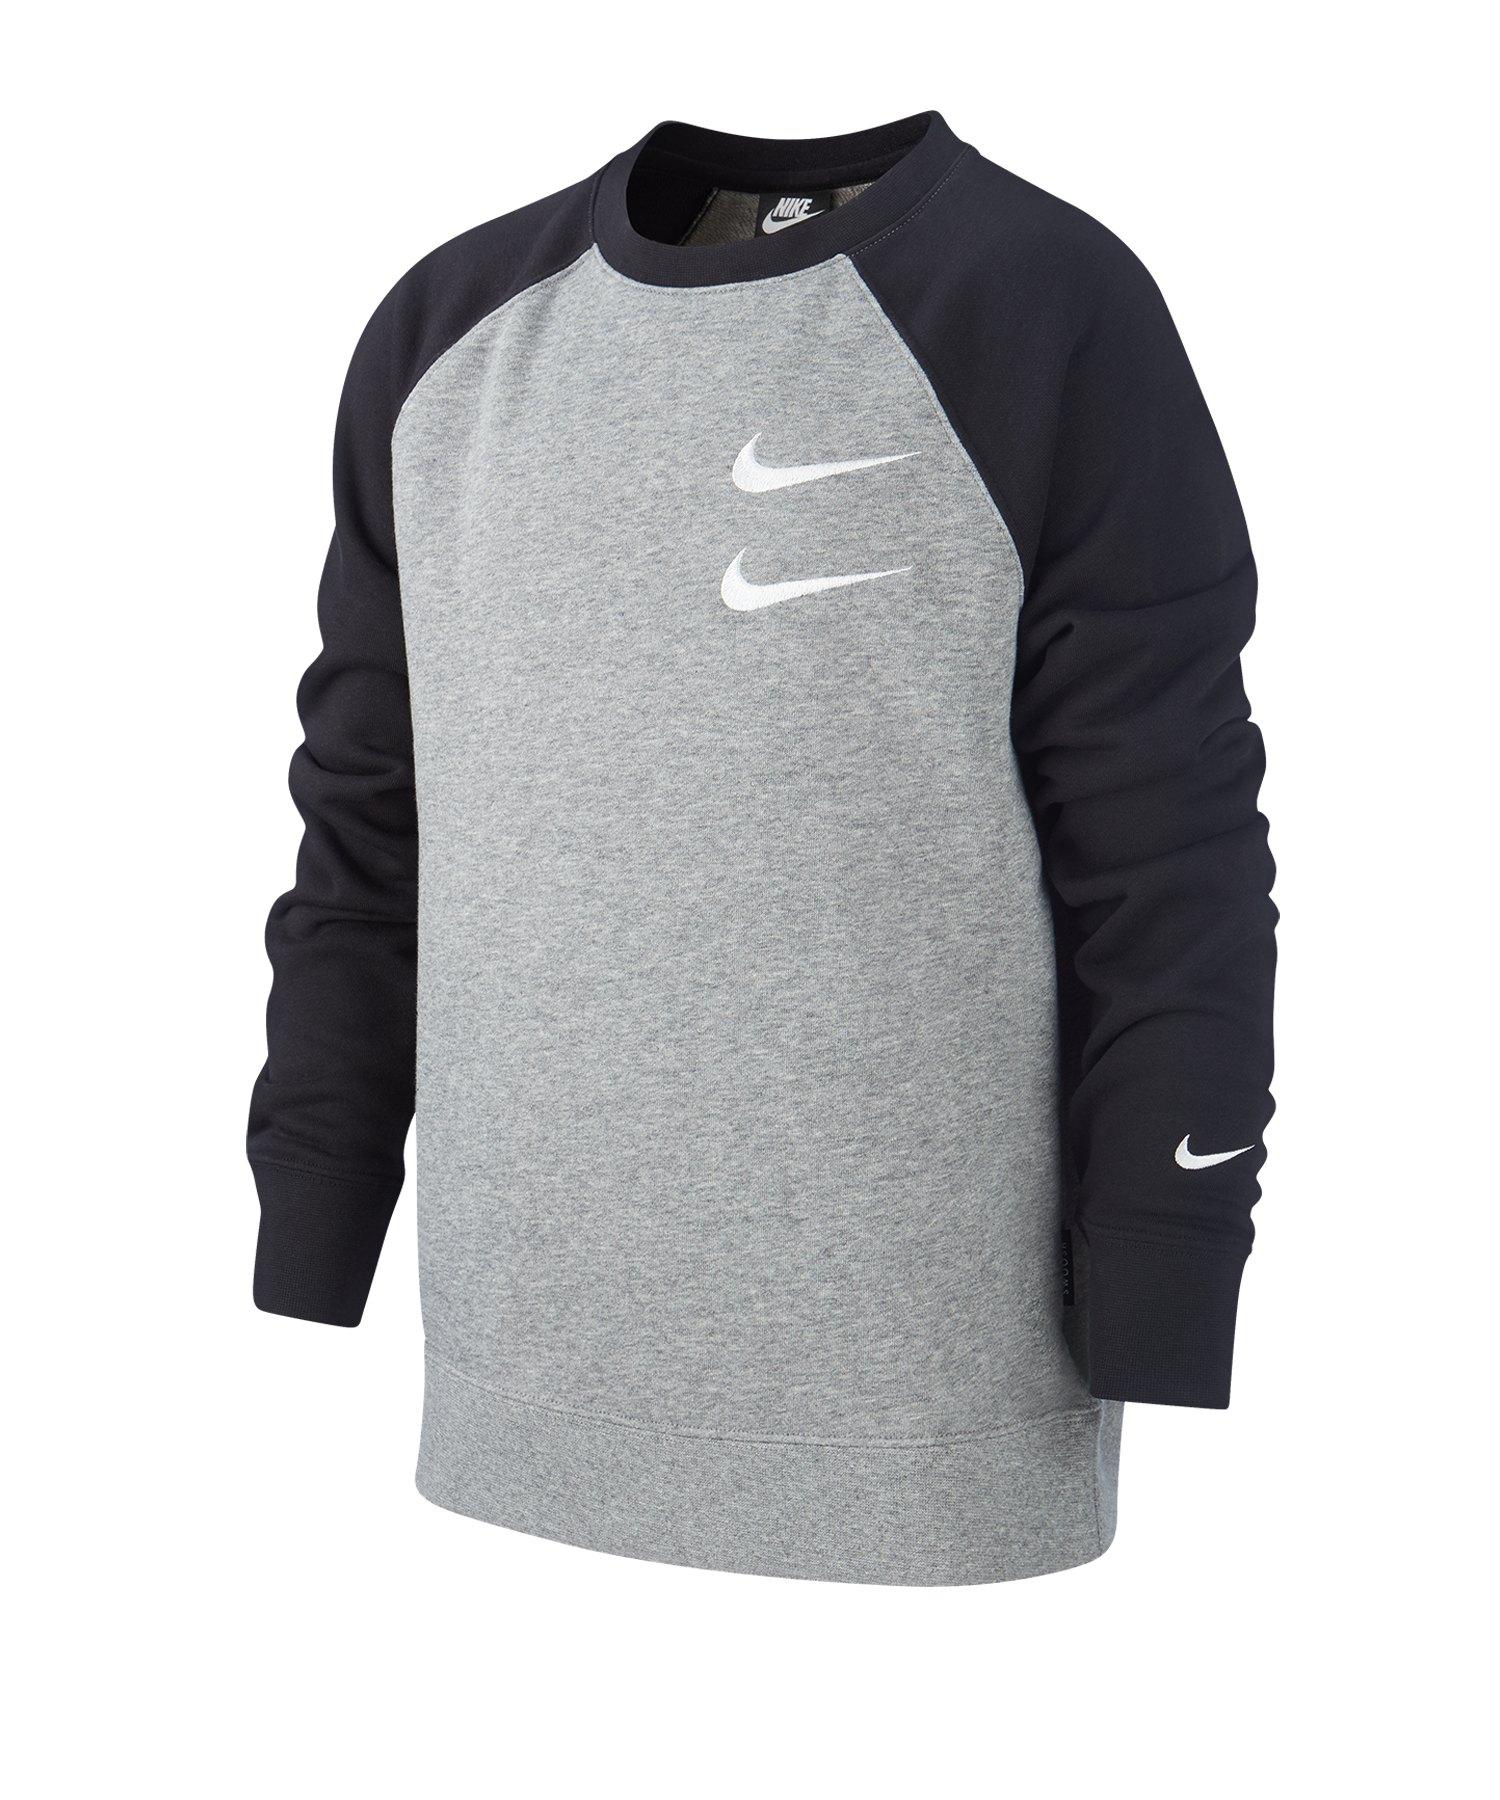 Nike Swoosh Crew Sweatshirt Kids Grau F091 - grau